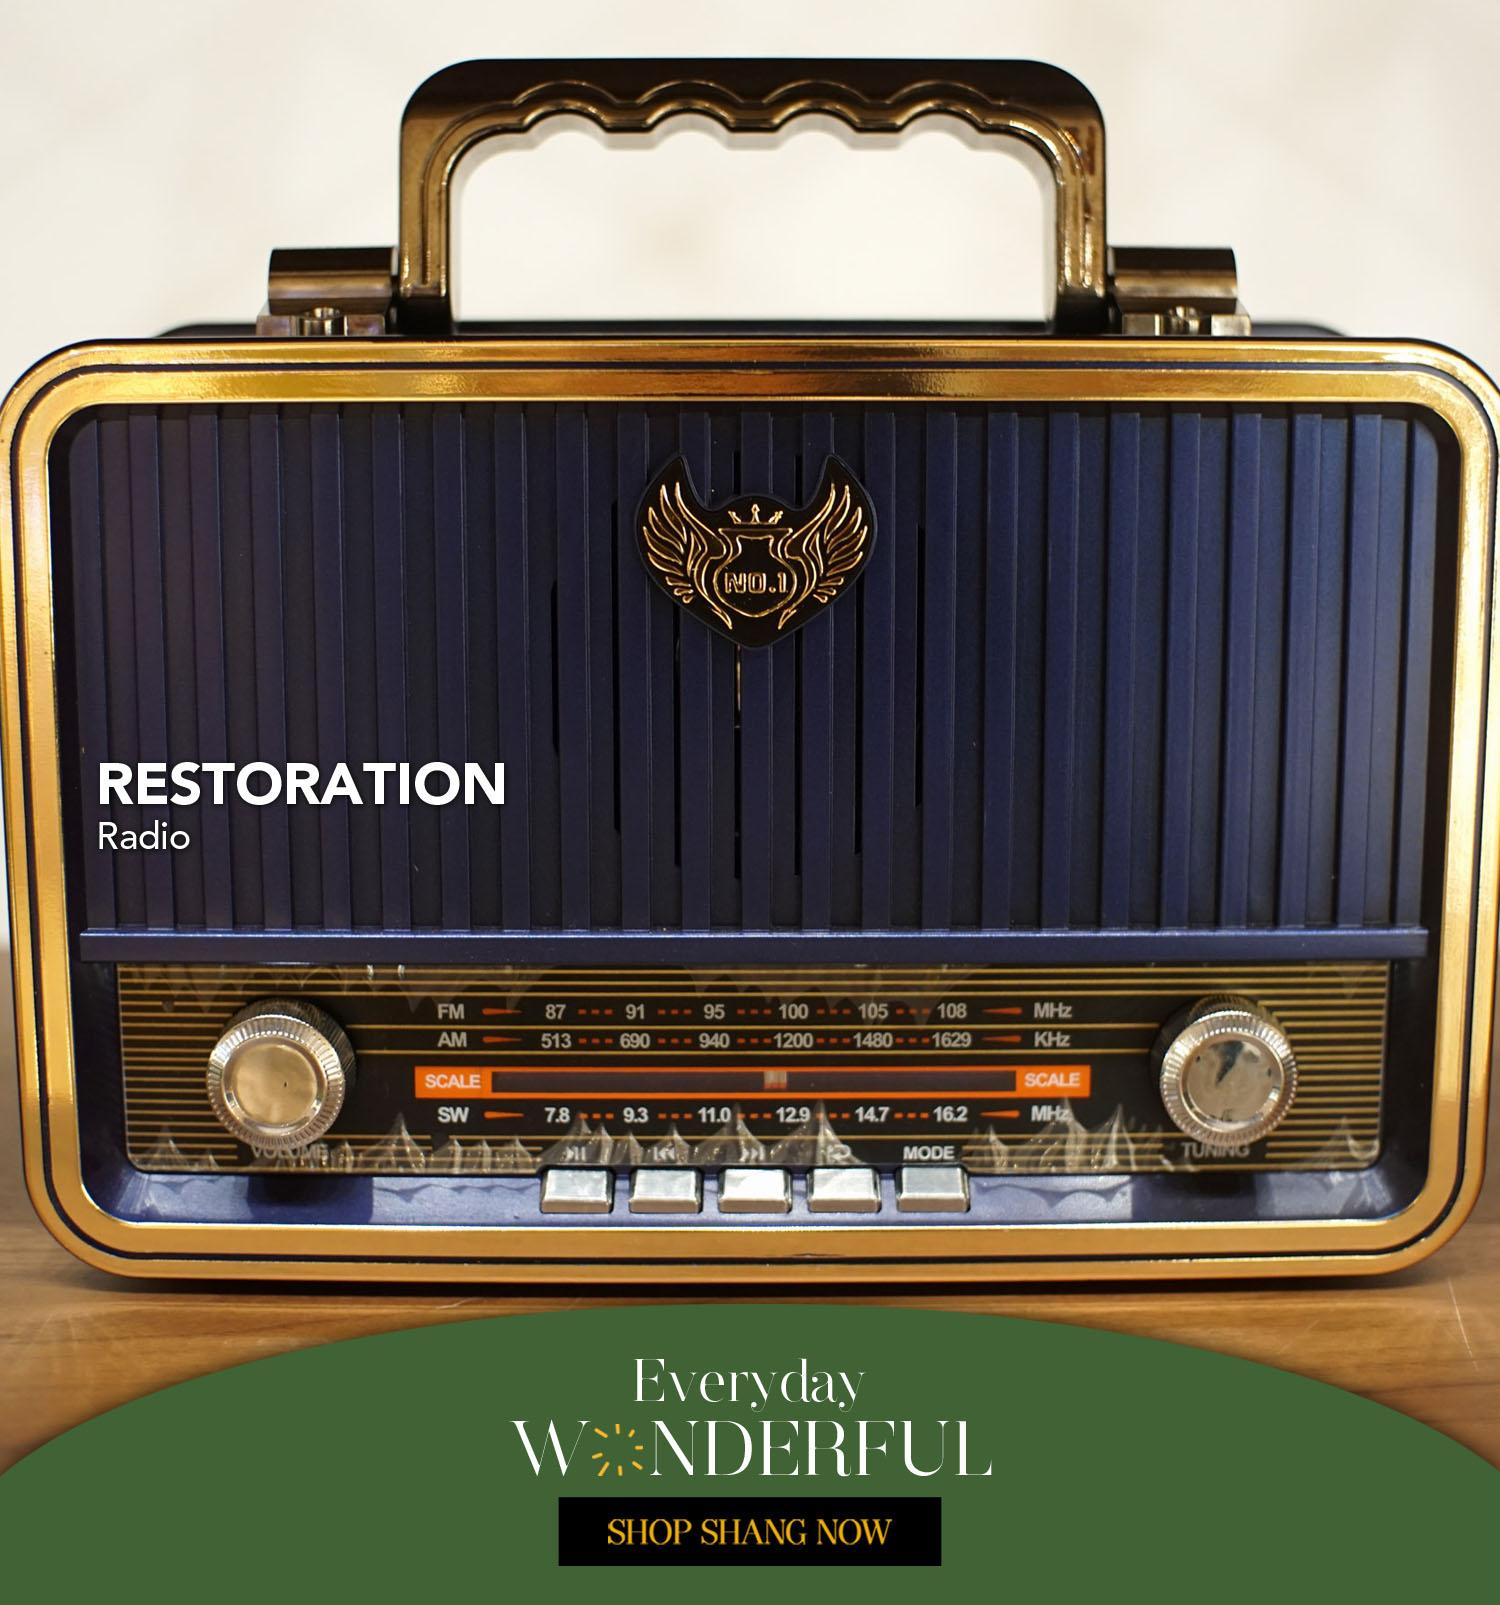 Radio from Restoration